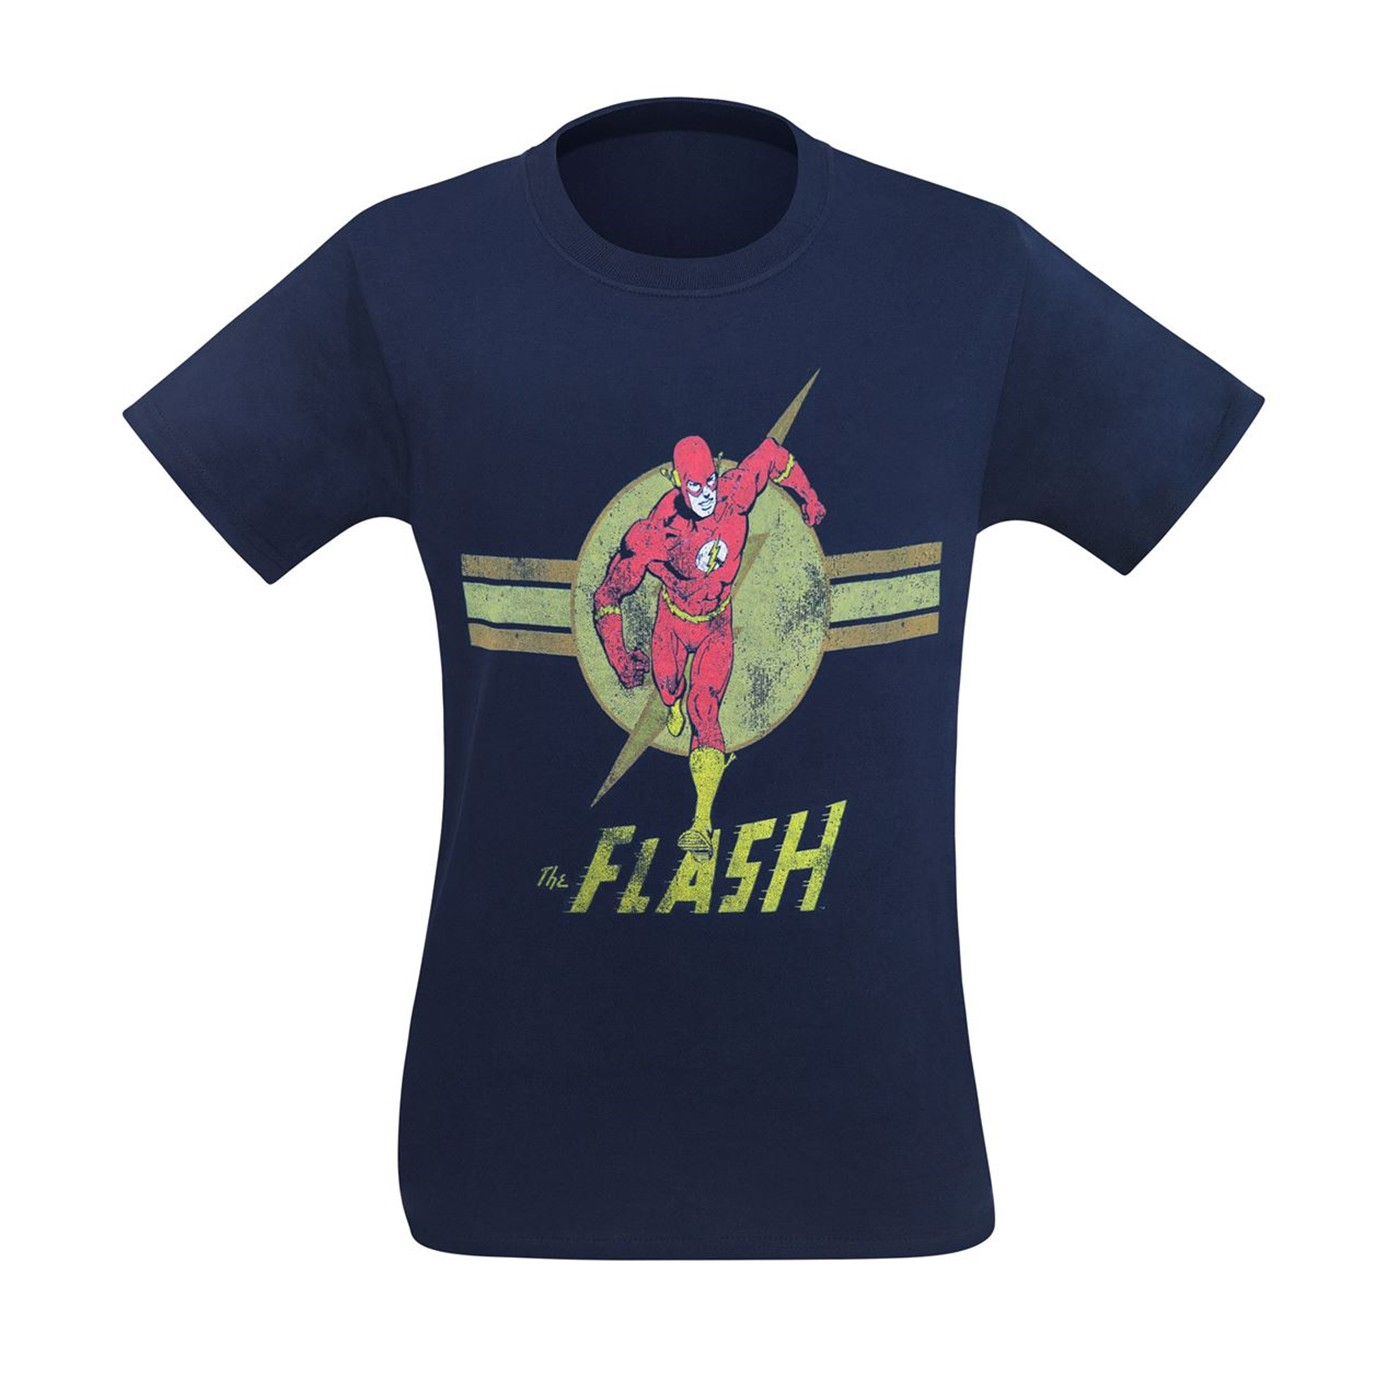 Flash Navy Blue Streaker 30 Single T-Shirt